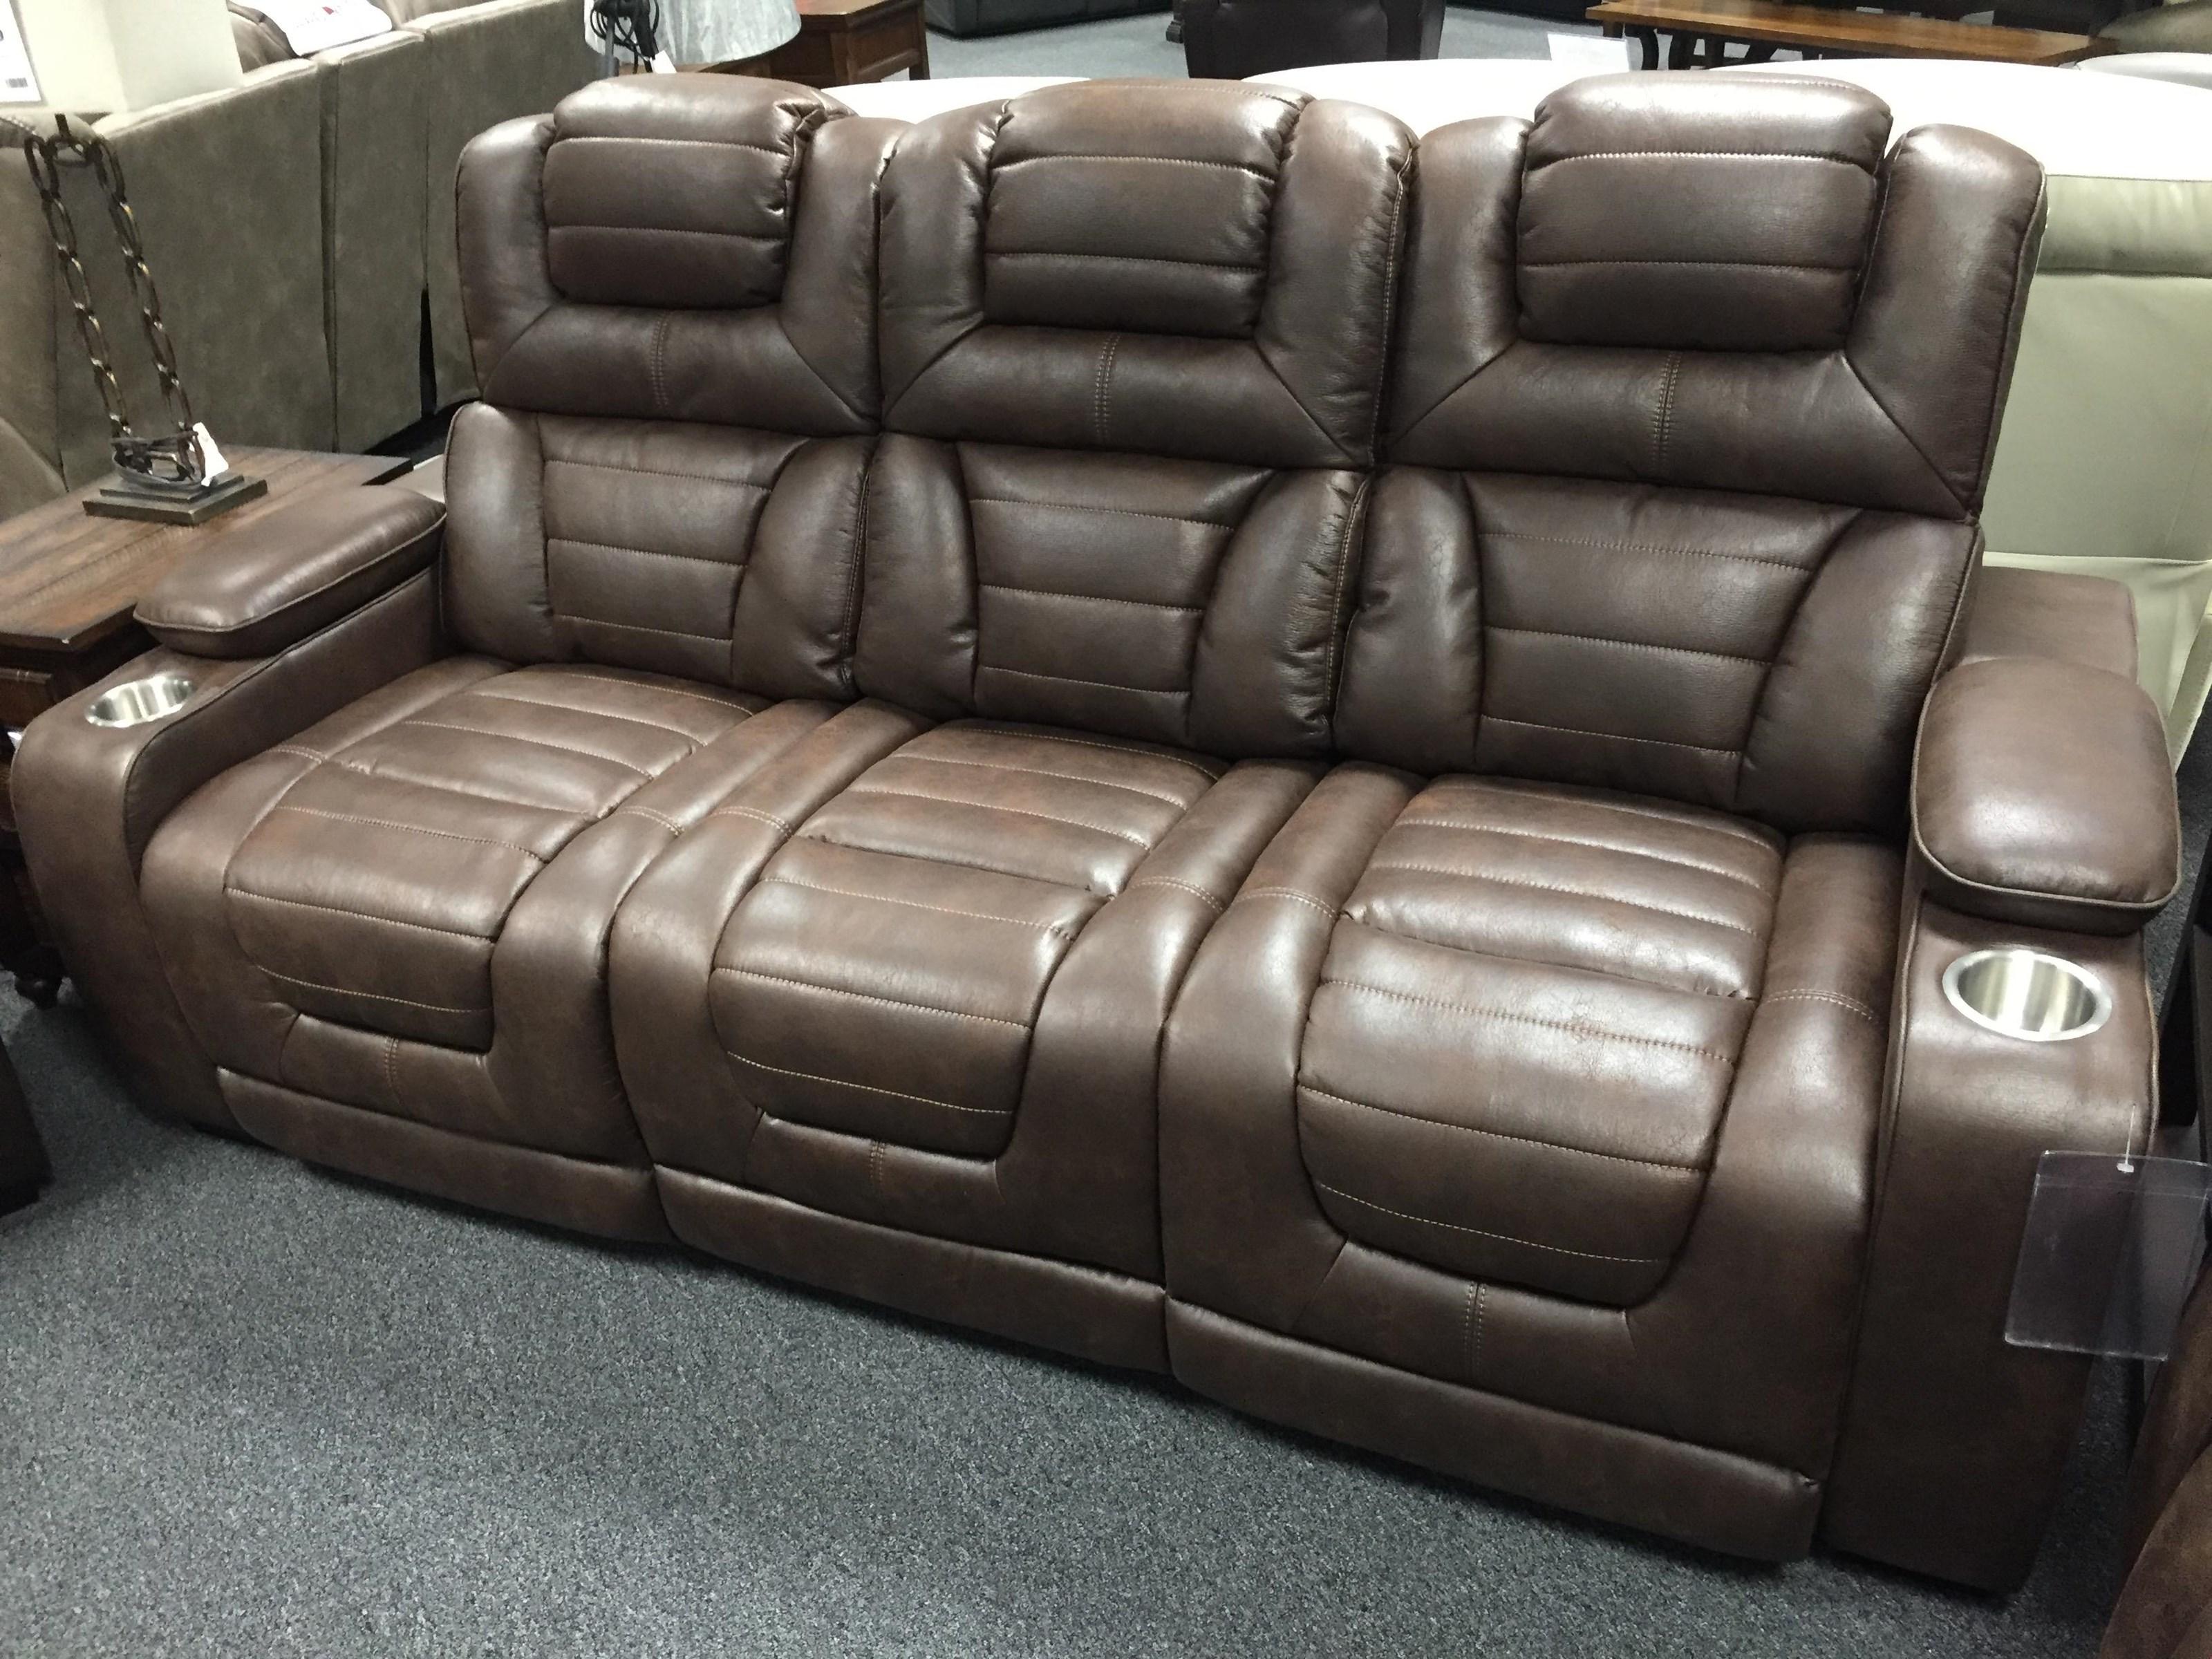 73901 Power Headrest Recline Sofa by Corinthian at Furniture Fair - North Carolina